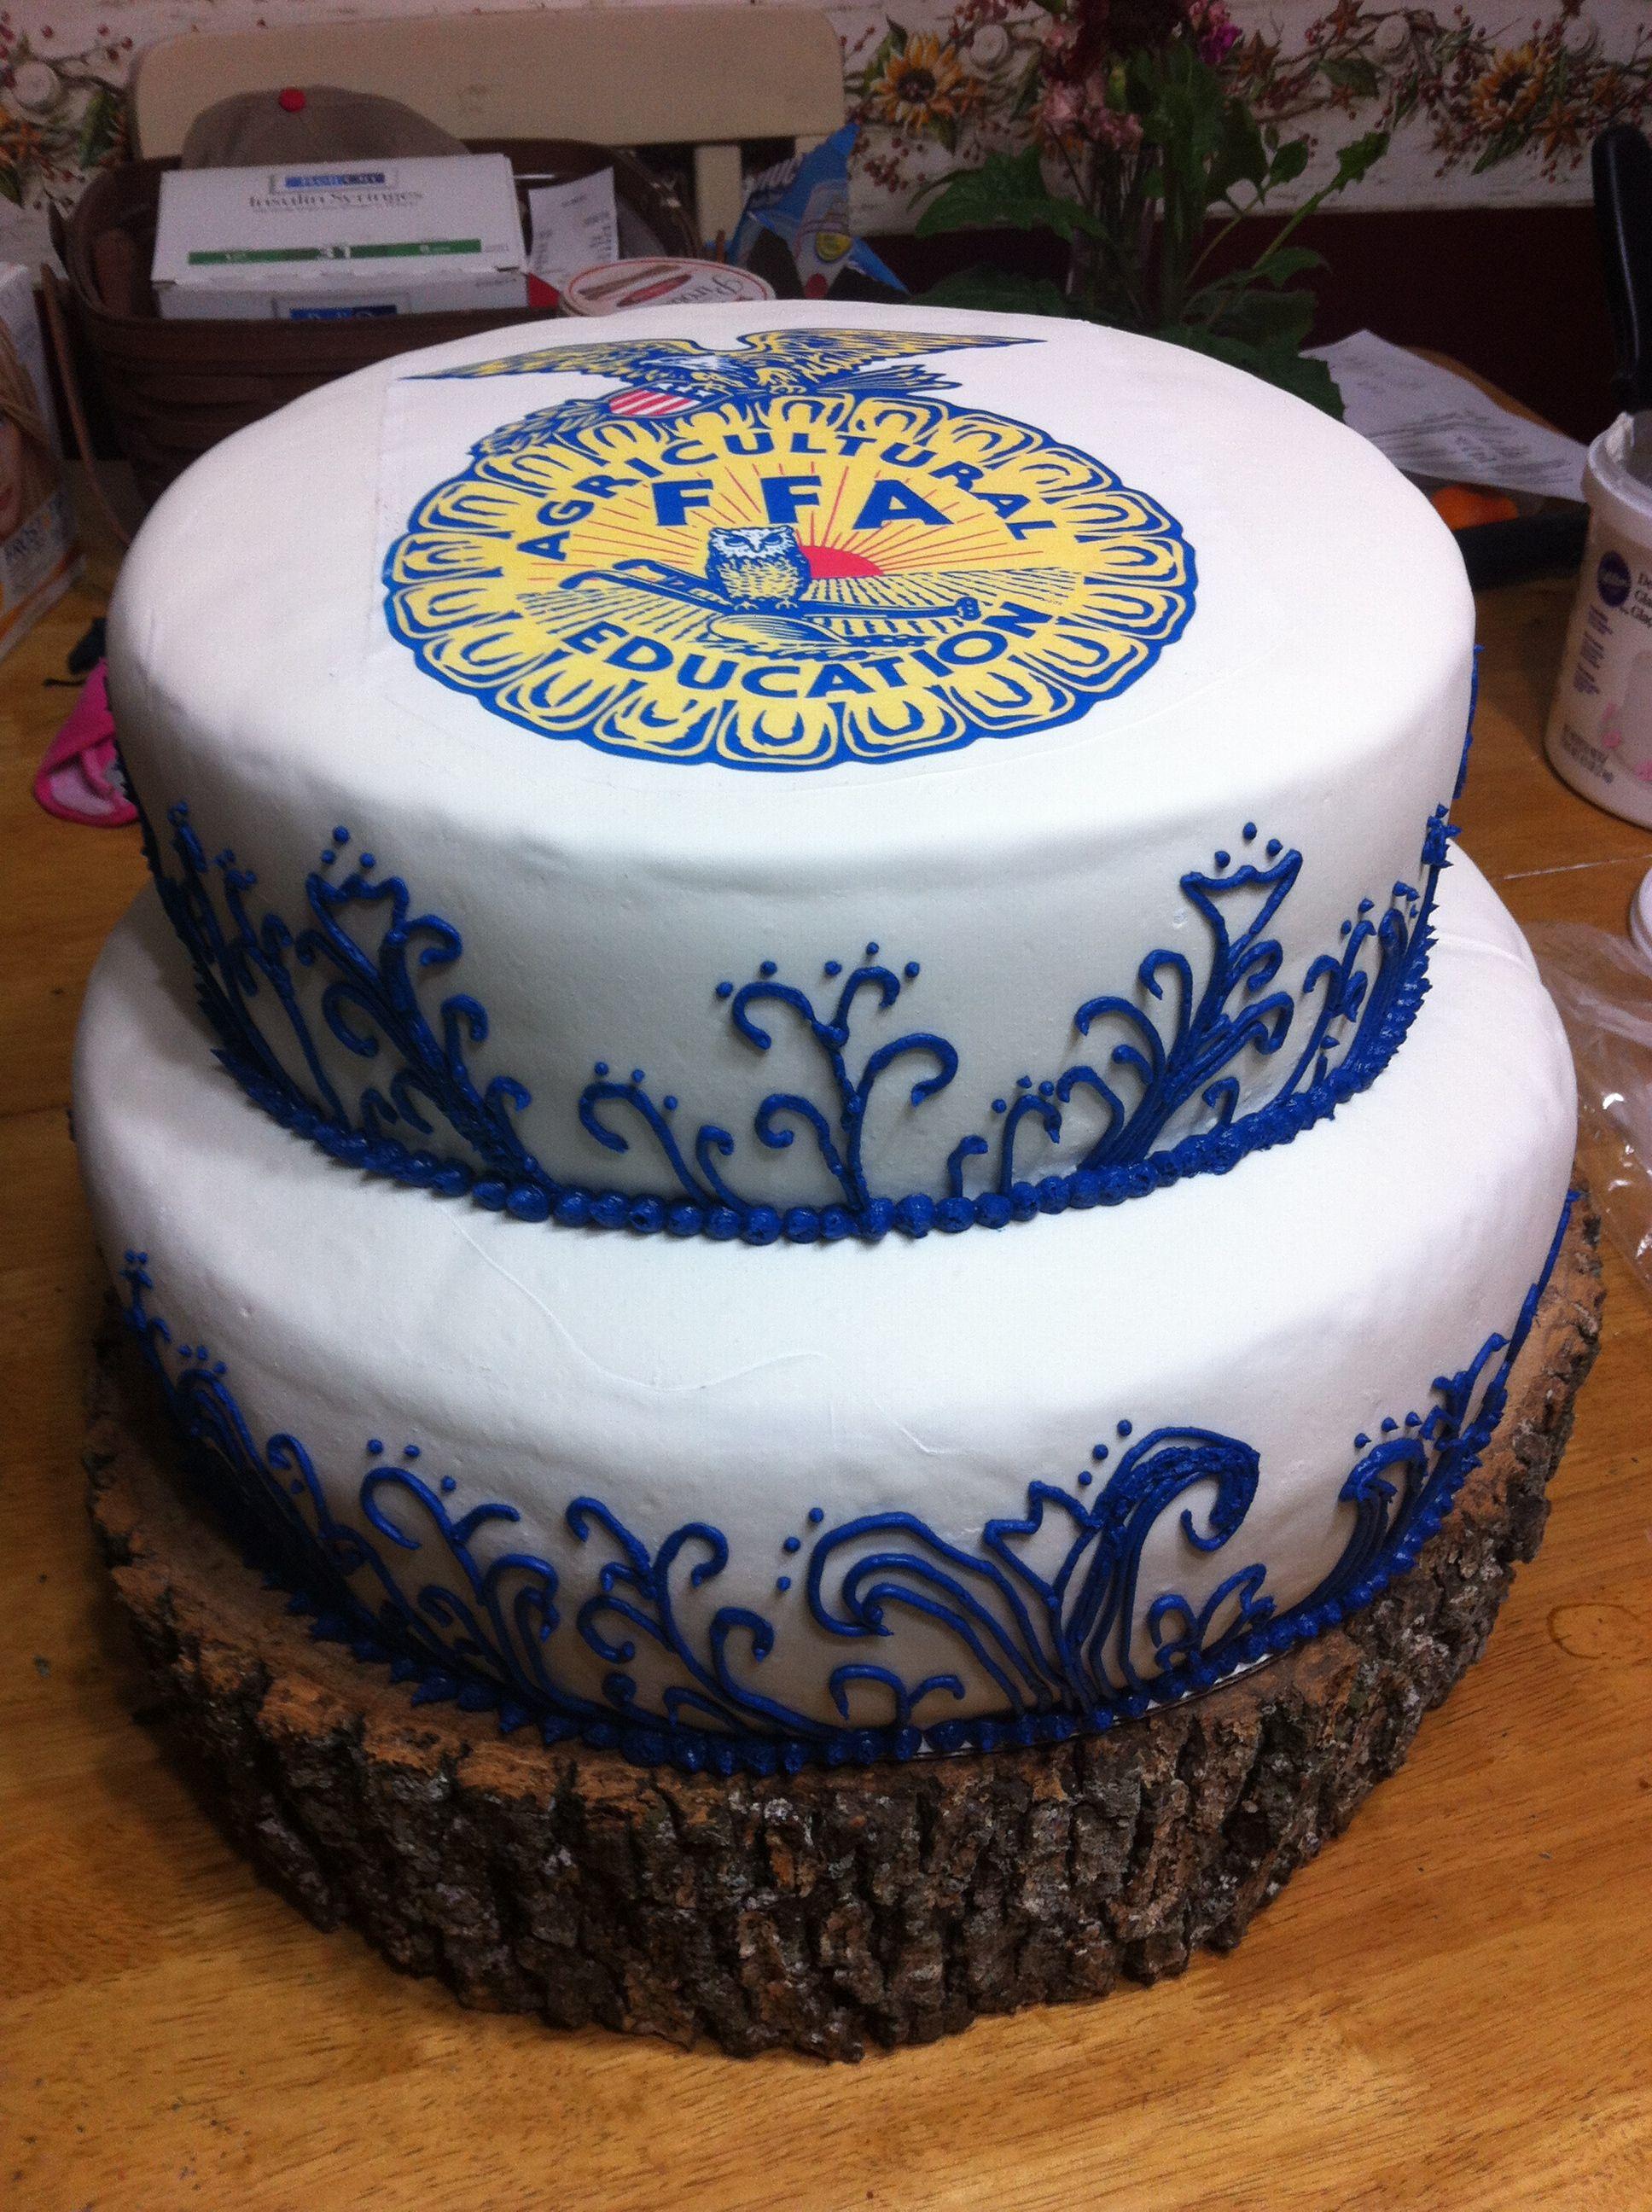 FFA cake!! Wish I could make this!!!!